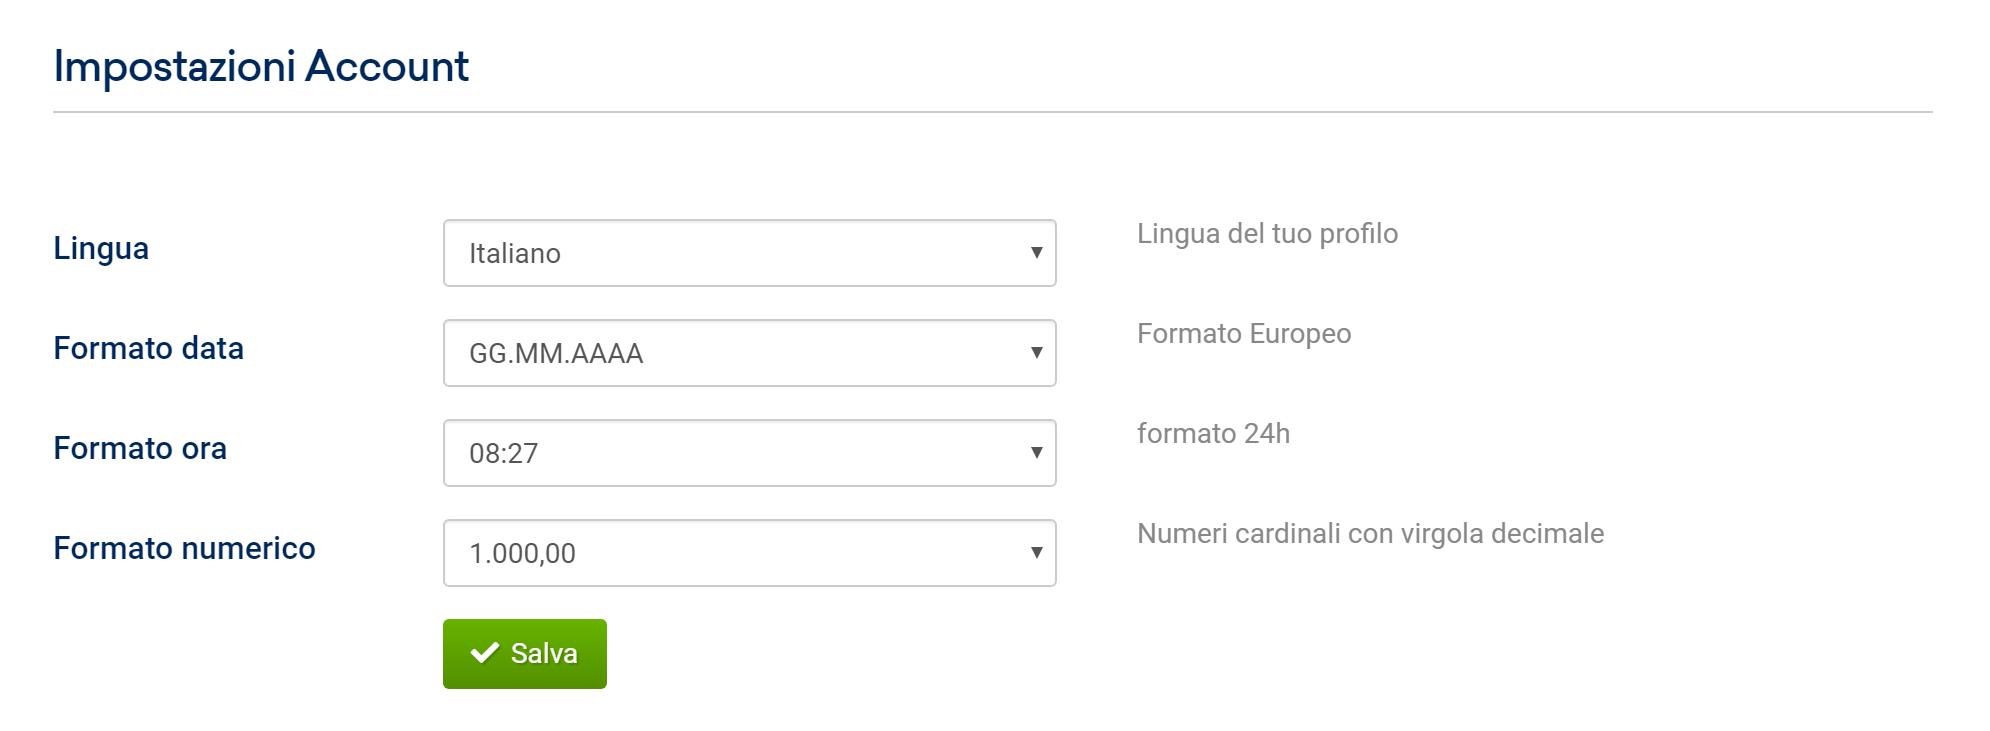 Impostazioni account base nel Toolbox SISTRIX